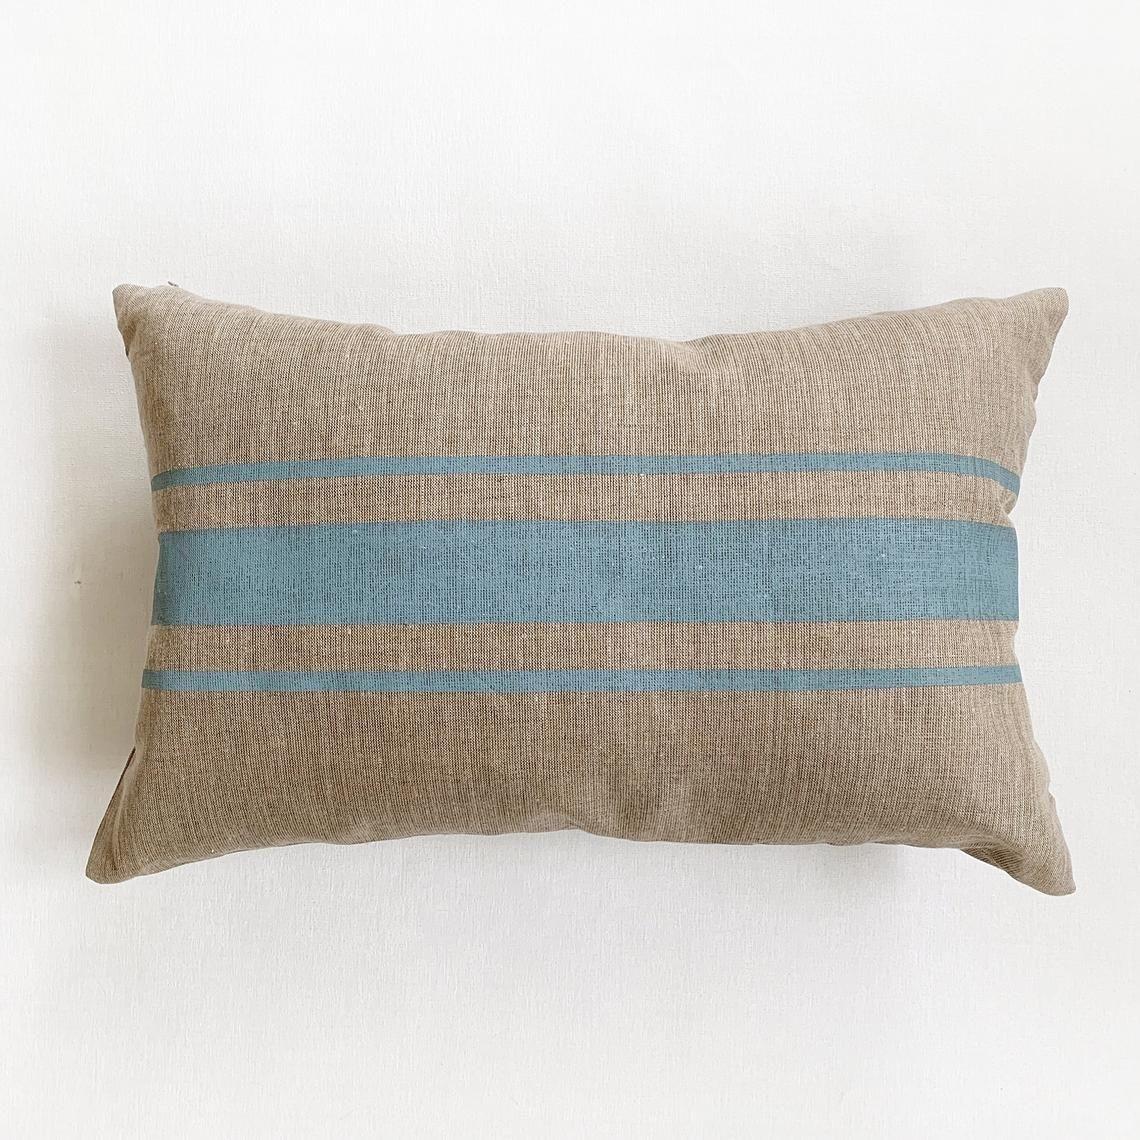 Blue Grain Sack Pillow Modern Farmhouse Pillow Covers Large Lumbar Pillow Grainsack Striped Pillows Linen Pillow Cover For Cottage Chic